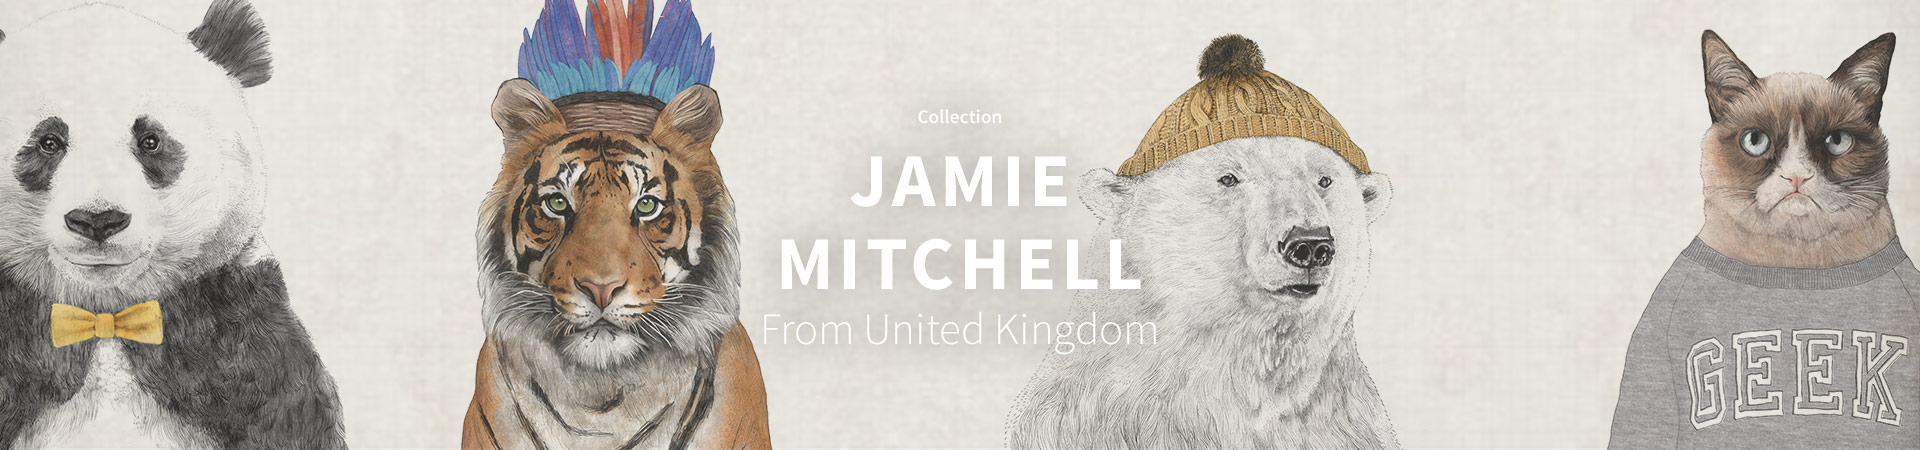 Jamie Mitchell